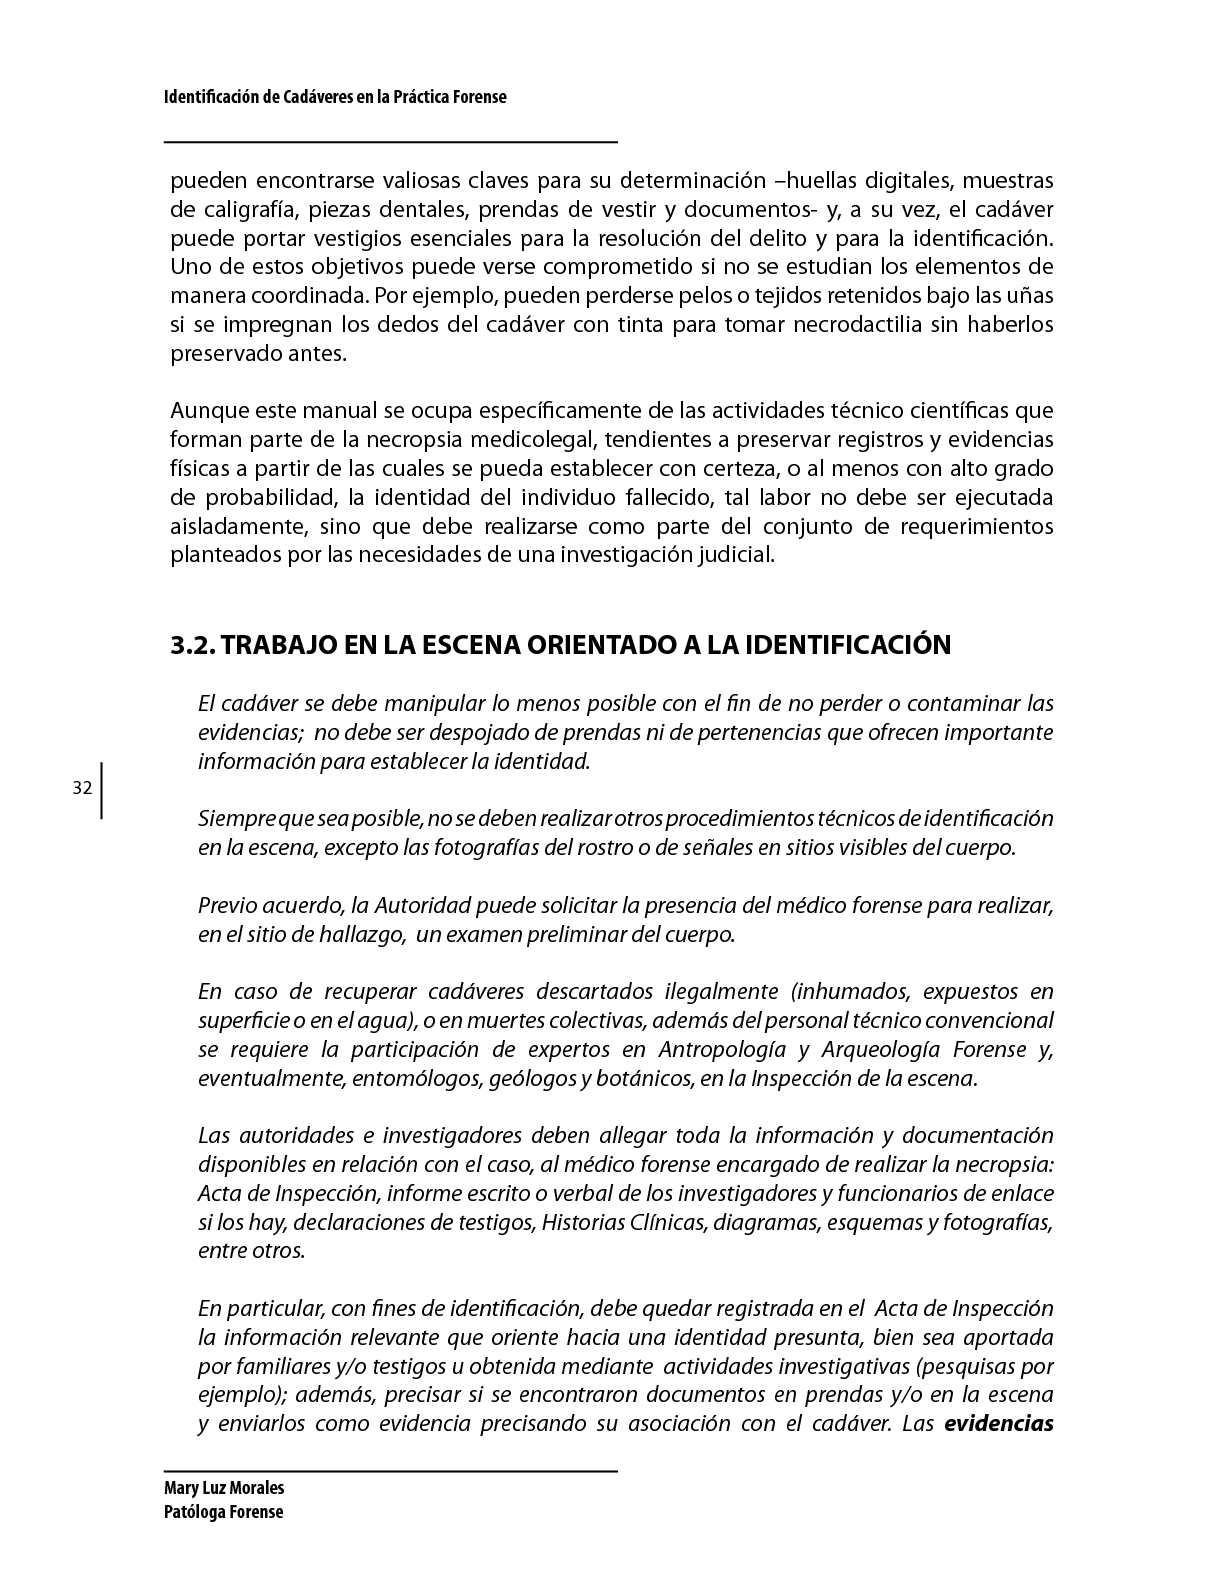 MANUAL DE IDENTIFICACION - CALAMEO Downloader